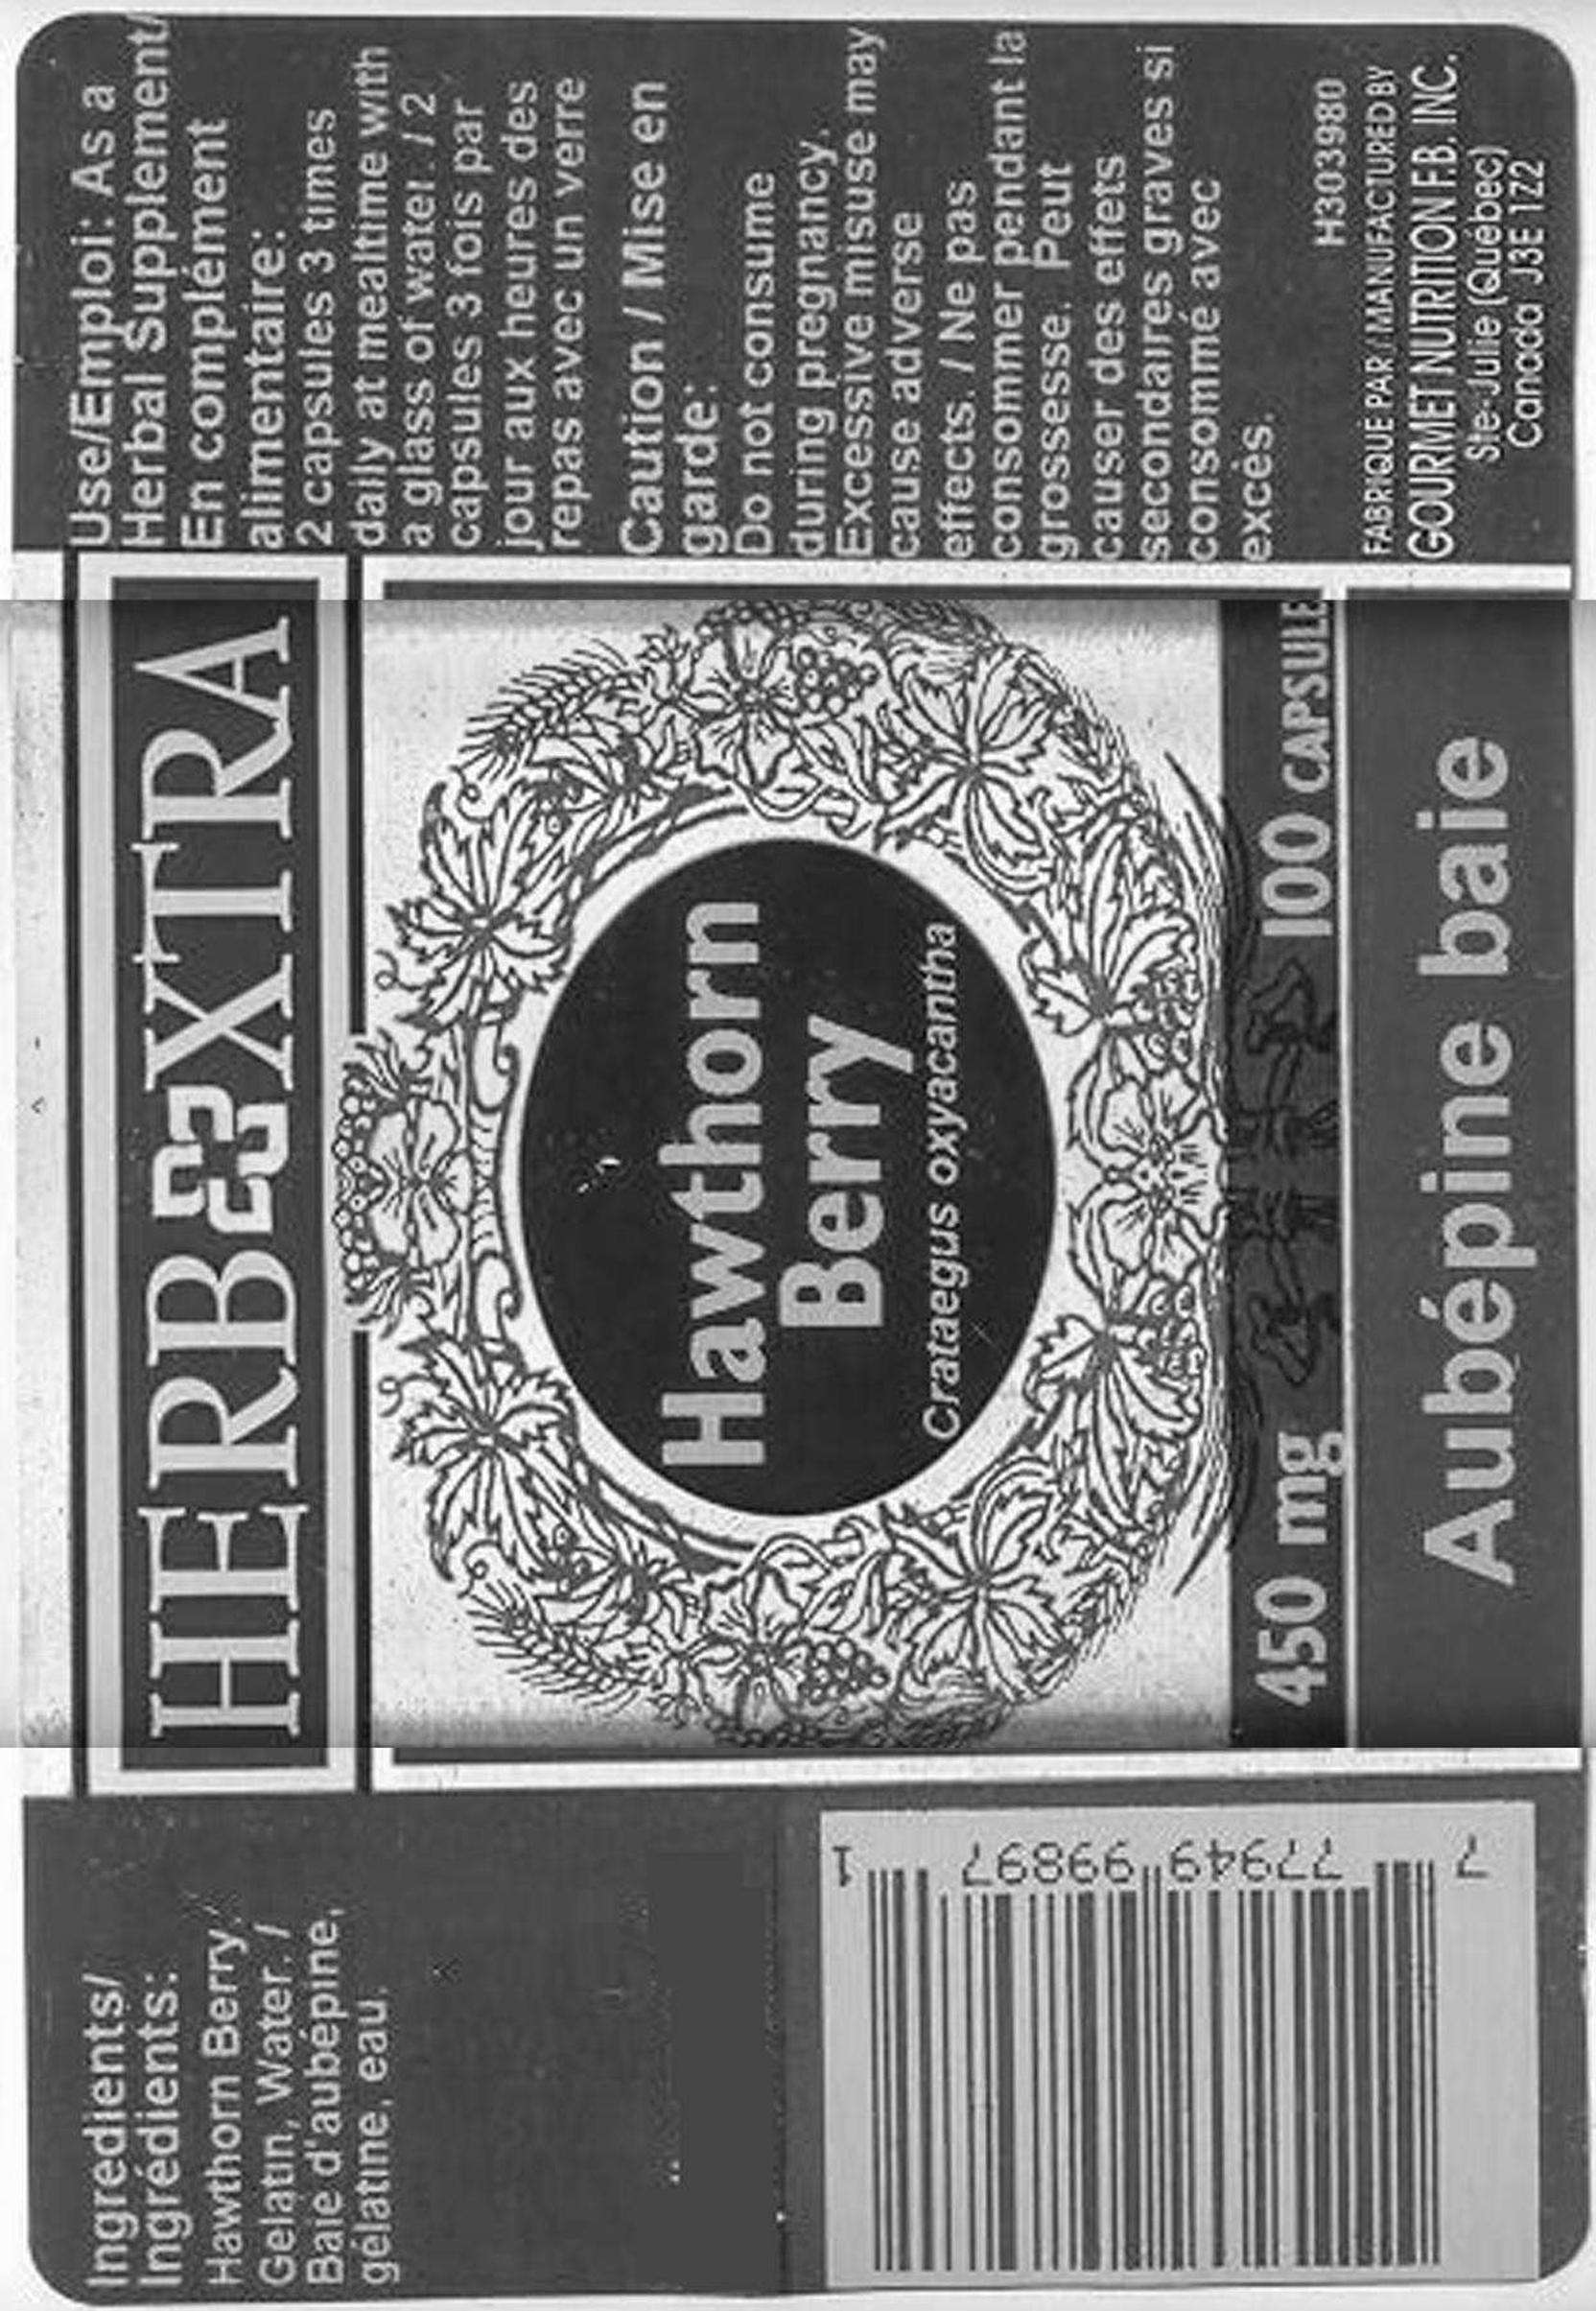 Hawthorn Berries - 450 mg - Label